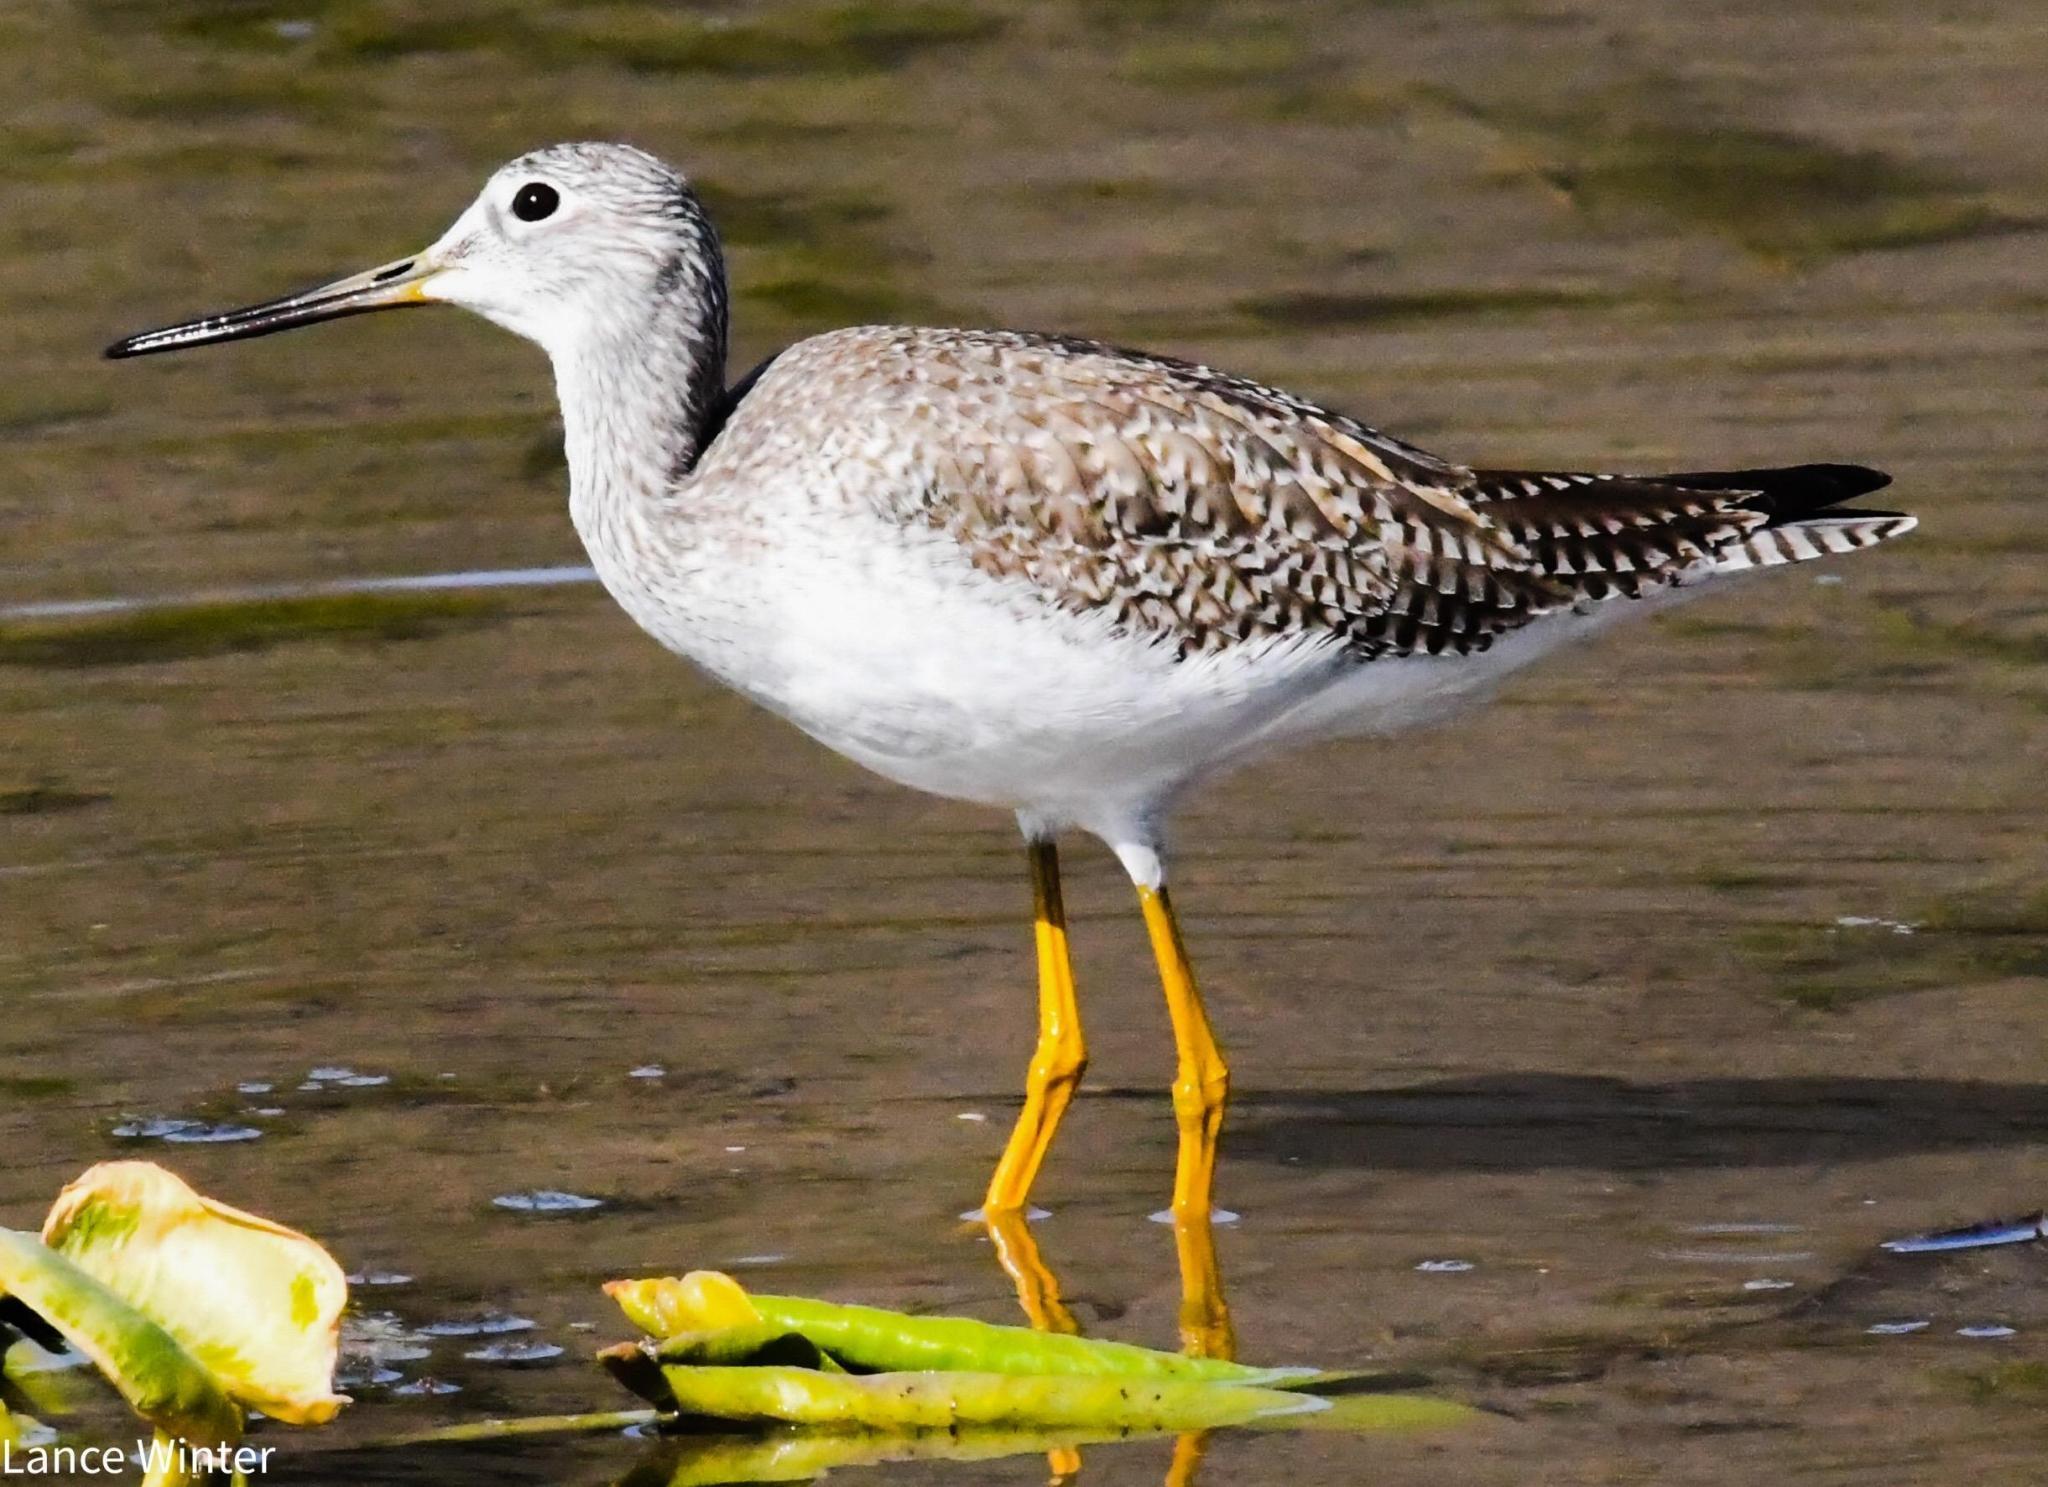 San Marcos, Spring Lake, wildlife, meadows center, birds, San Marcos News, San Marcos Record